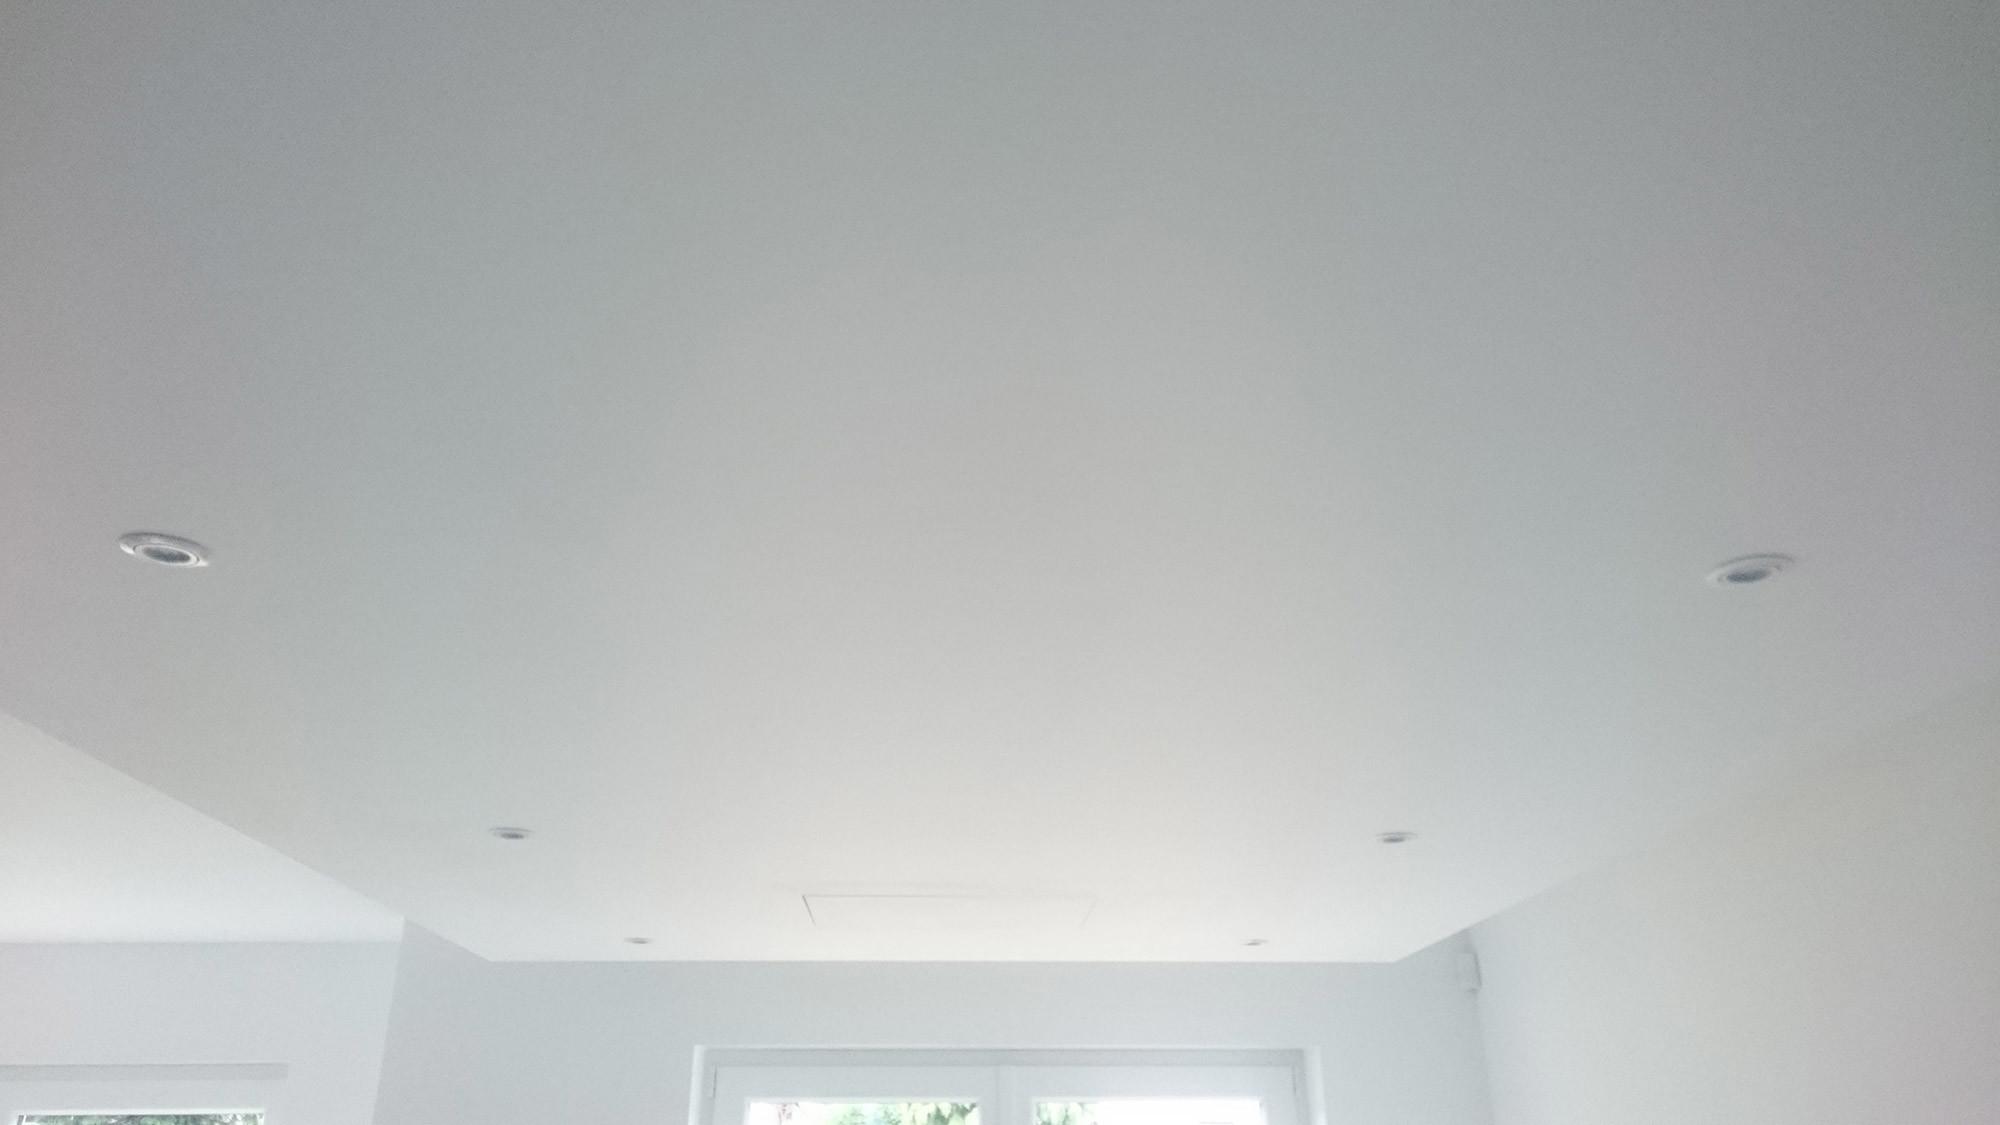 Indirekte beleuchtung selber bauen wand: indirekte beleuchtung ...